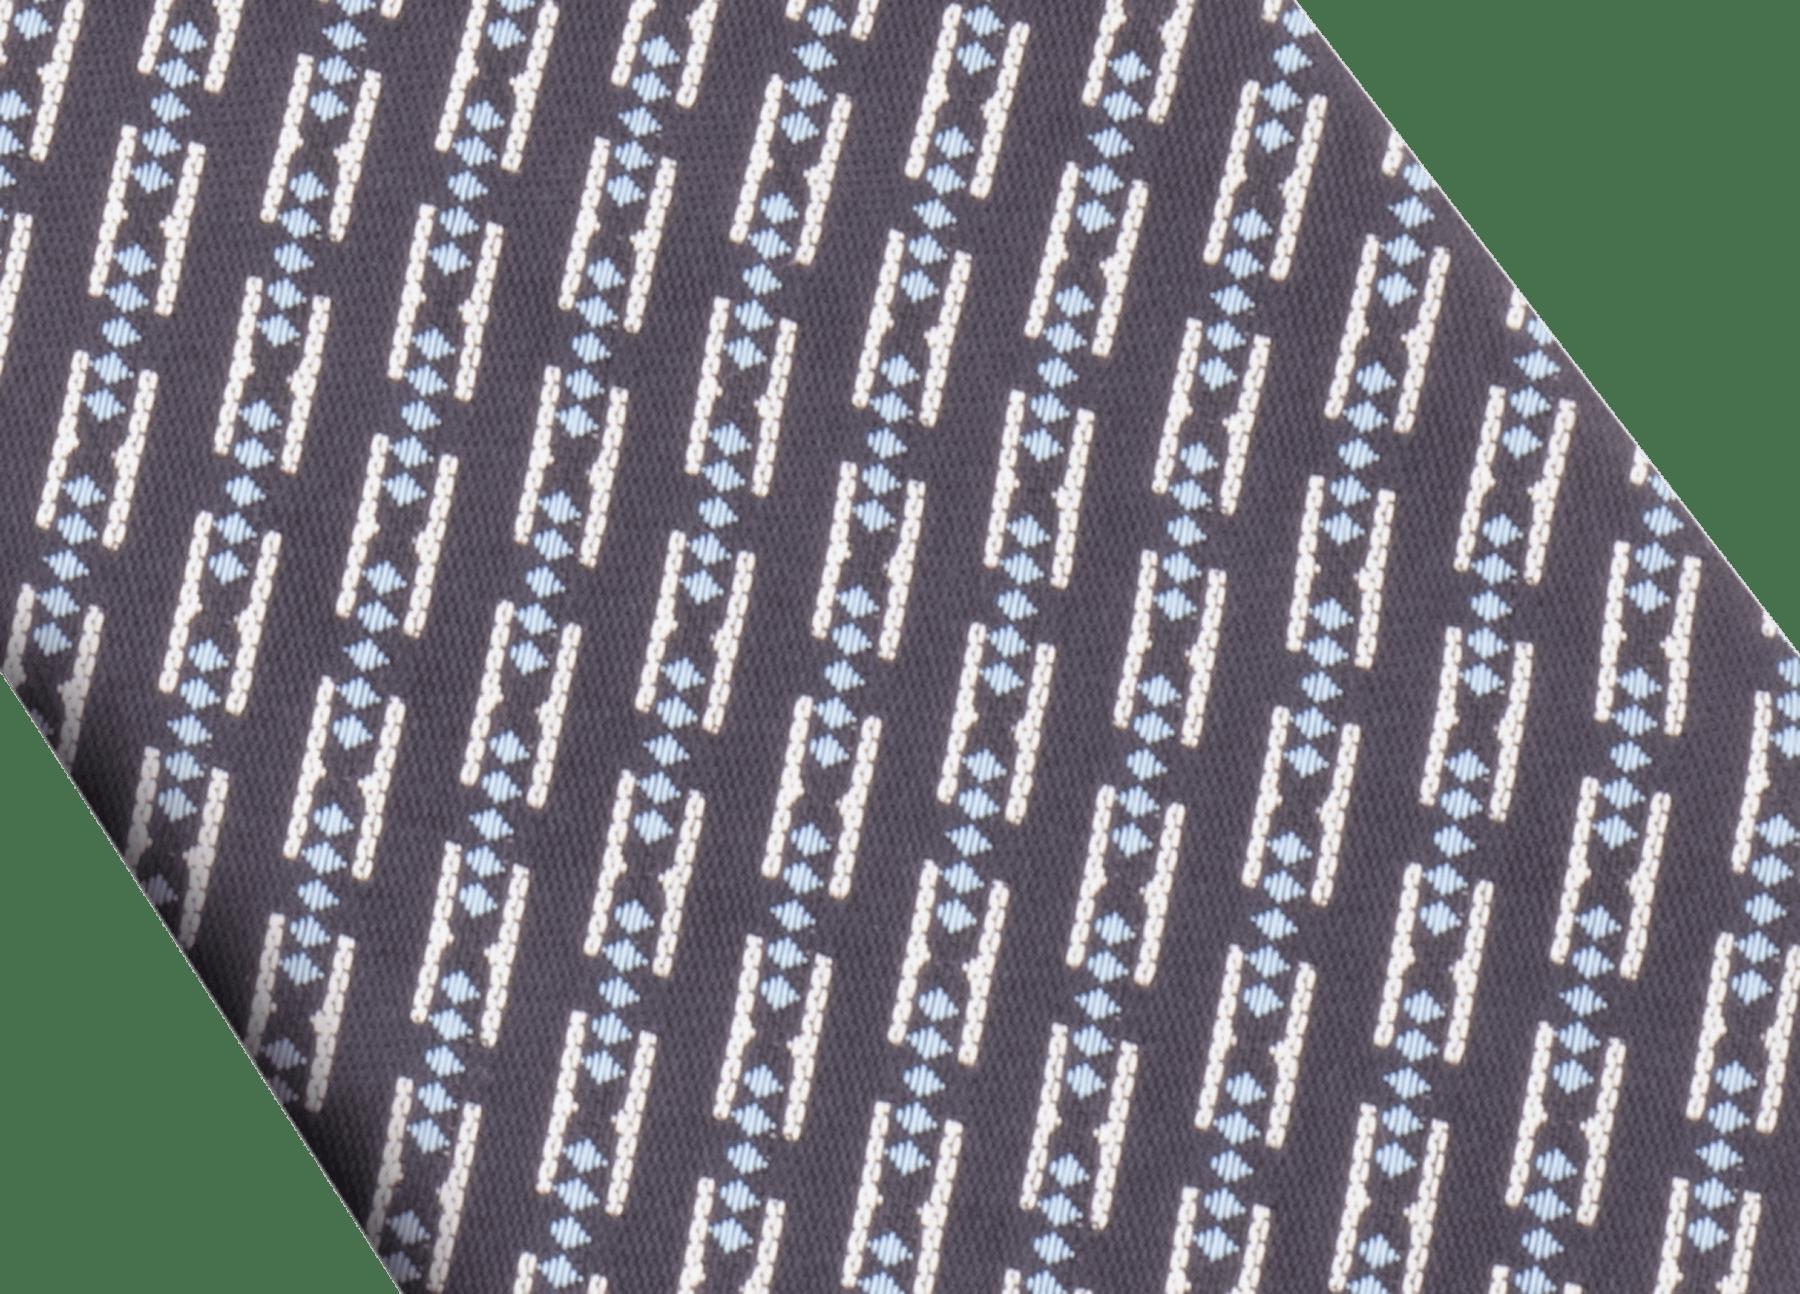 Rote doppelseitige Double BZero3D Krawatte aus feiner Seide. DOUBLEBZERO3D image 2